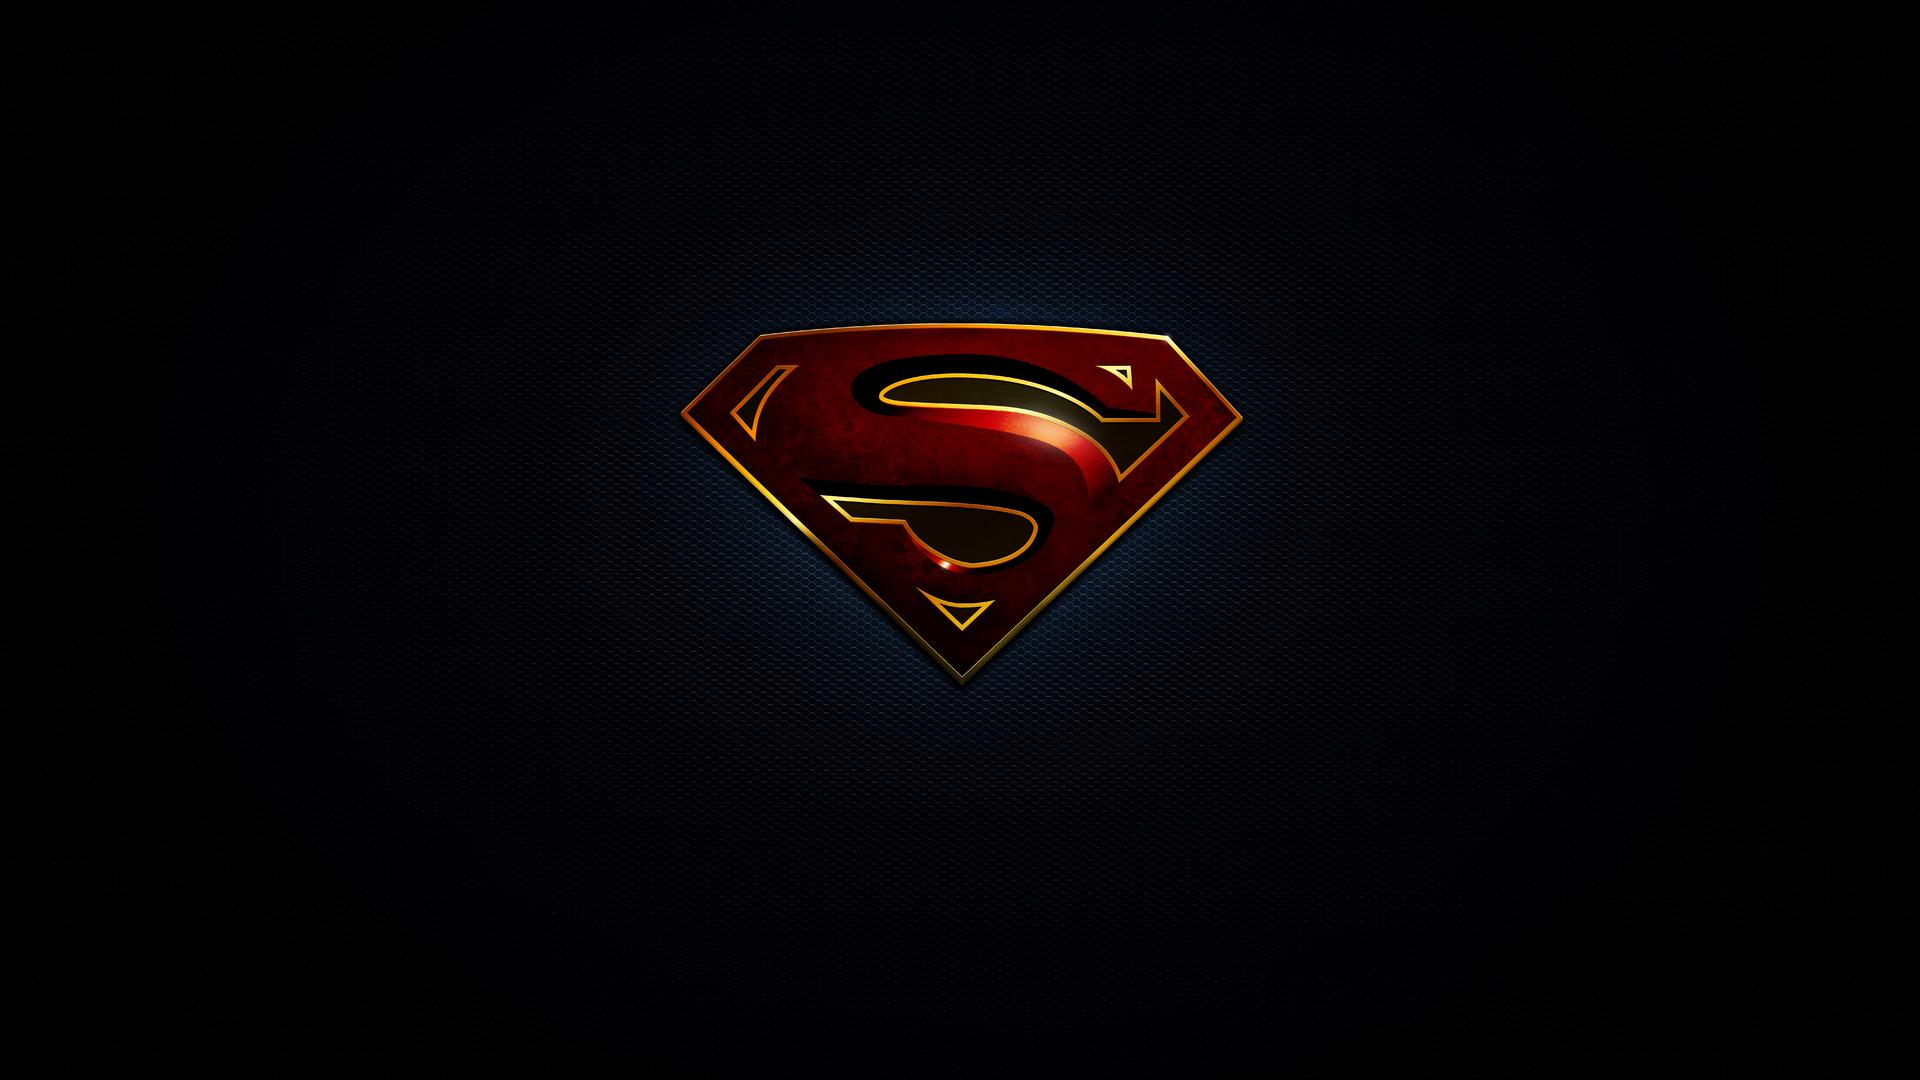 1920x1080 superman logo 10k laptop full hd 1080p hd 4k wallpapers superman logo 10k vxg voltagebd Choice Image